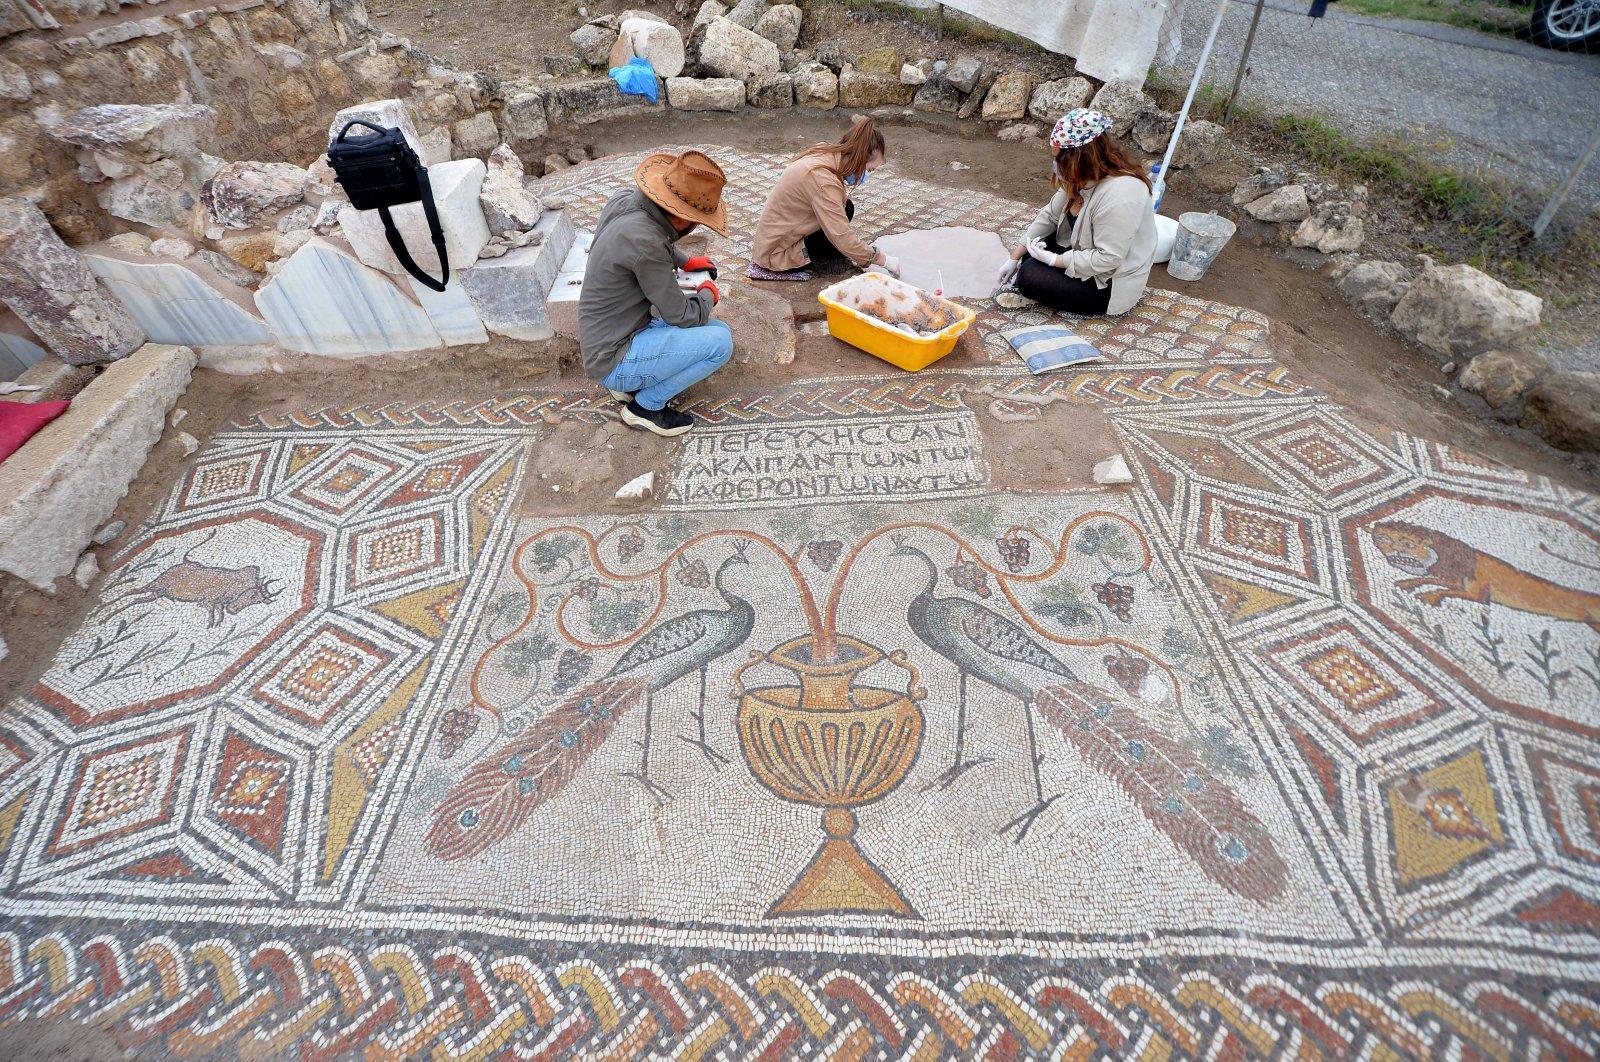 Archaeologists work on mosaics of the ancient city of Hadrianopolis, Karabük, Turkey, July 11, 2021. (AA Photo)